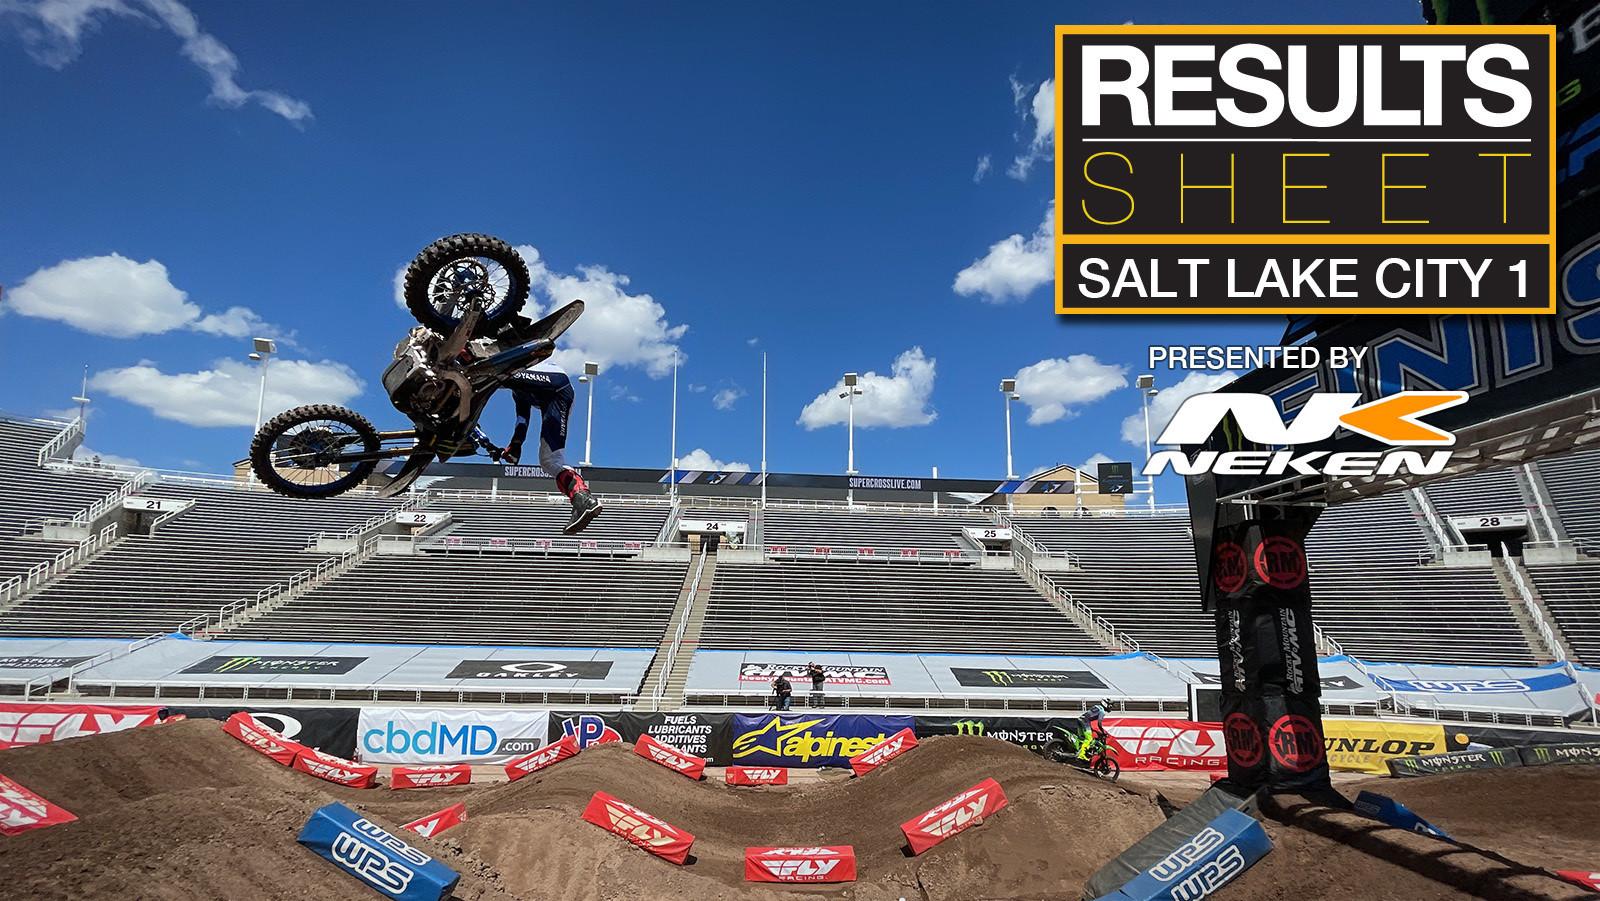 Results Sheet: 2021 Salt Lake City 1 Supercross